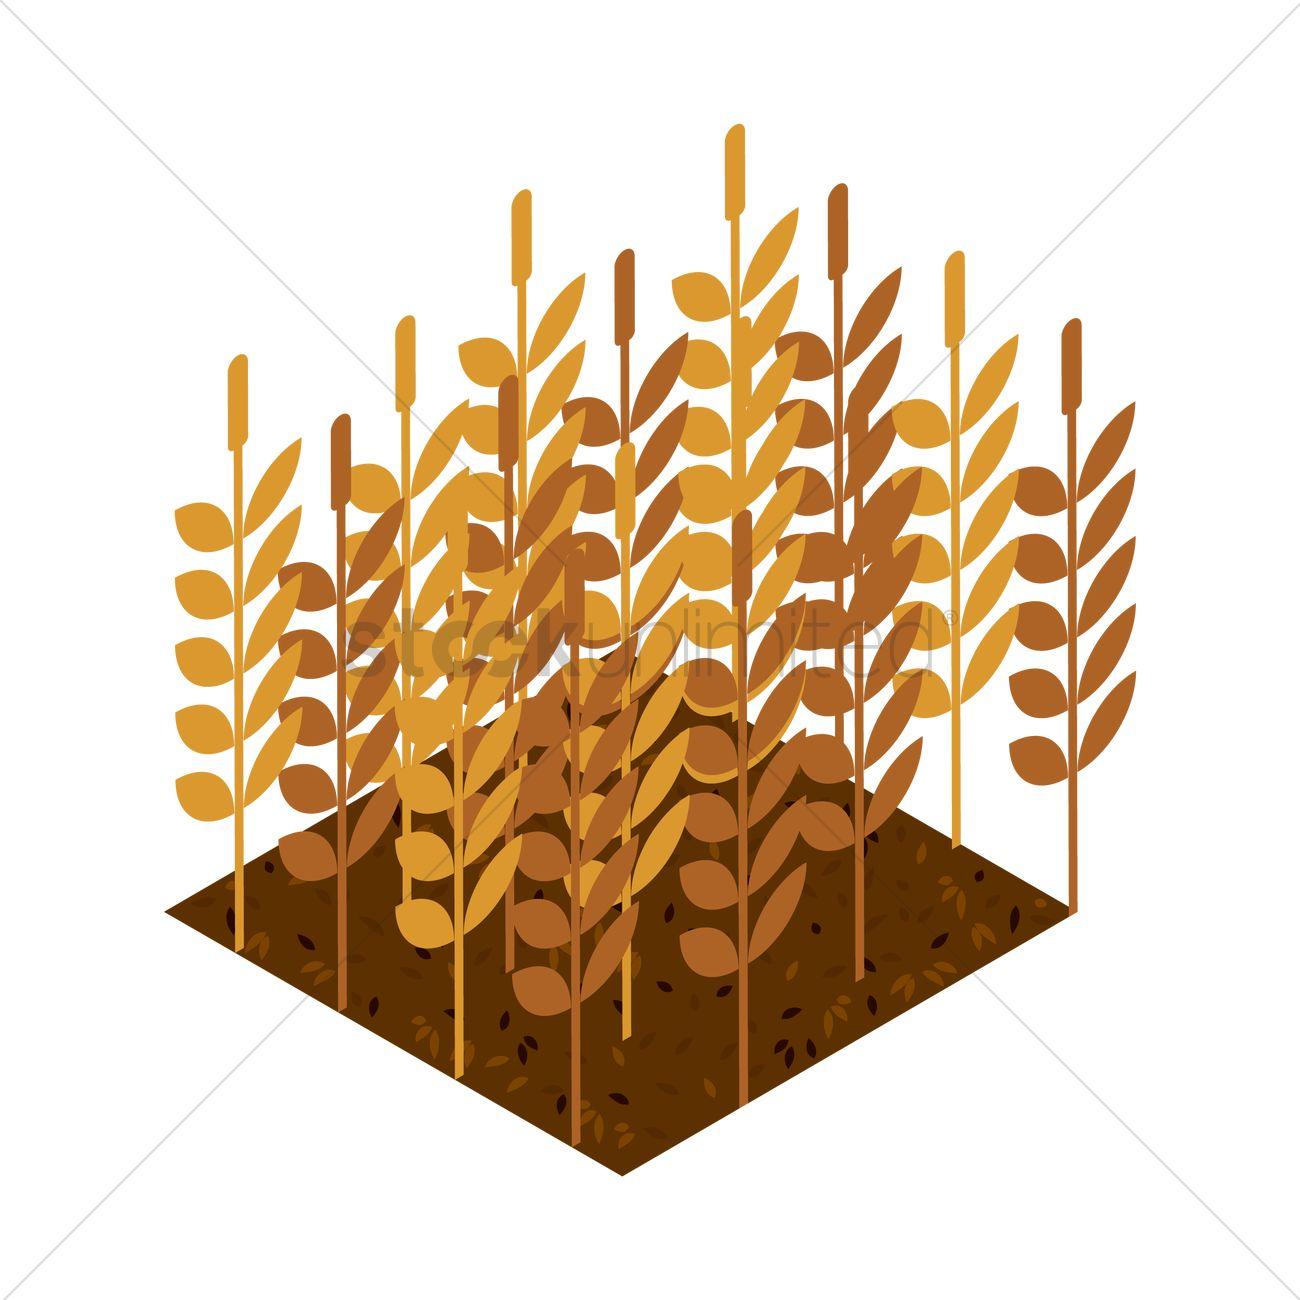 Wheat stalks Vector Im...